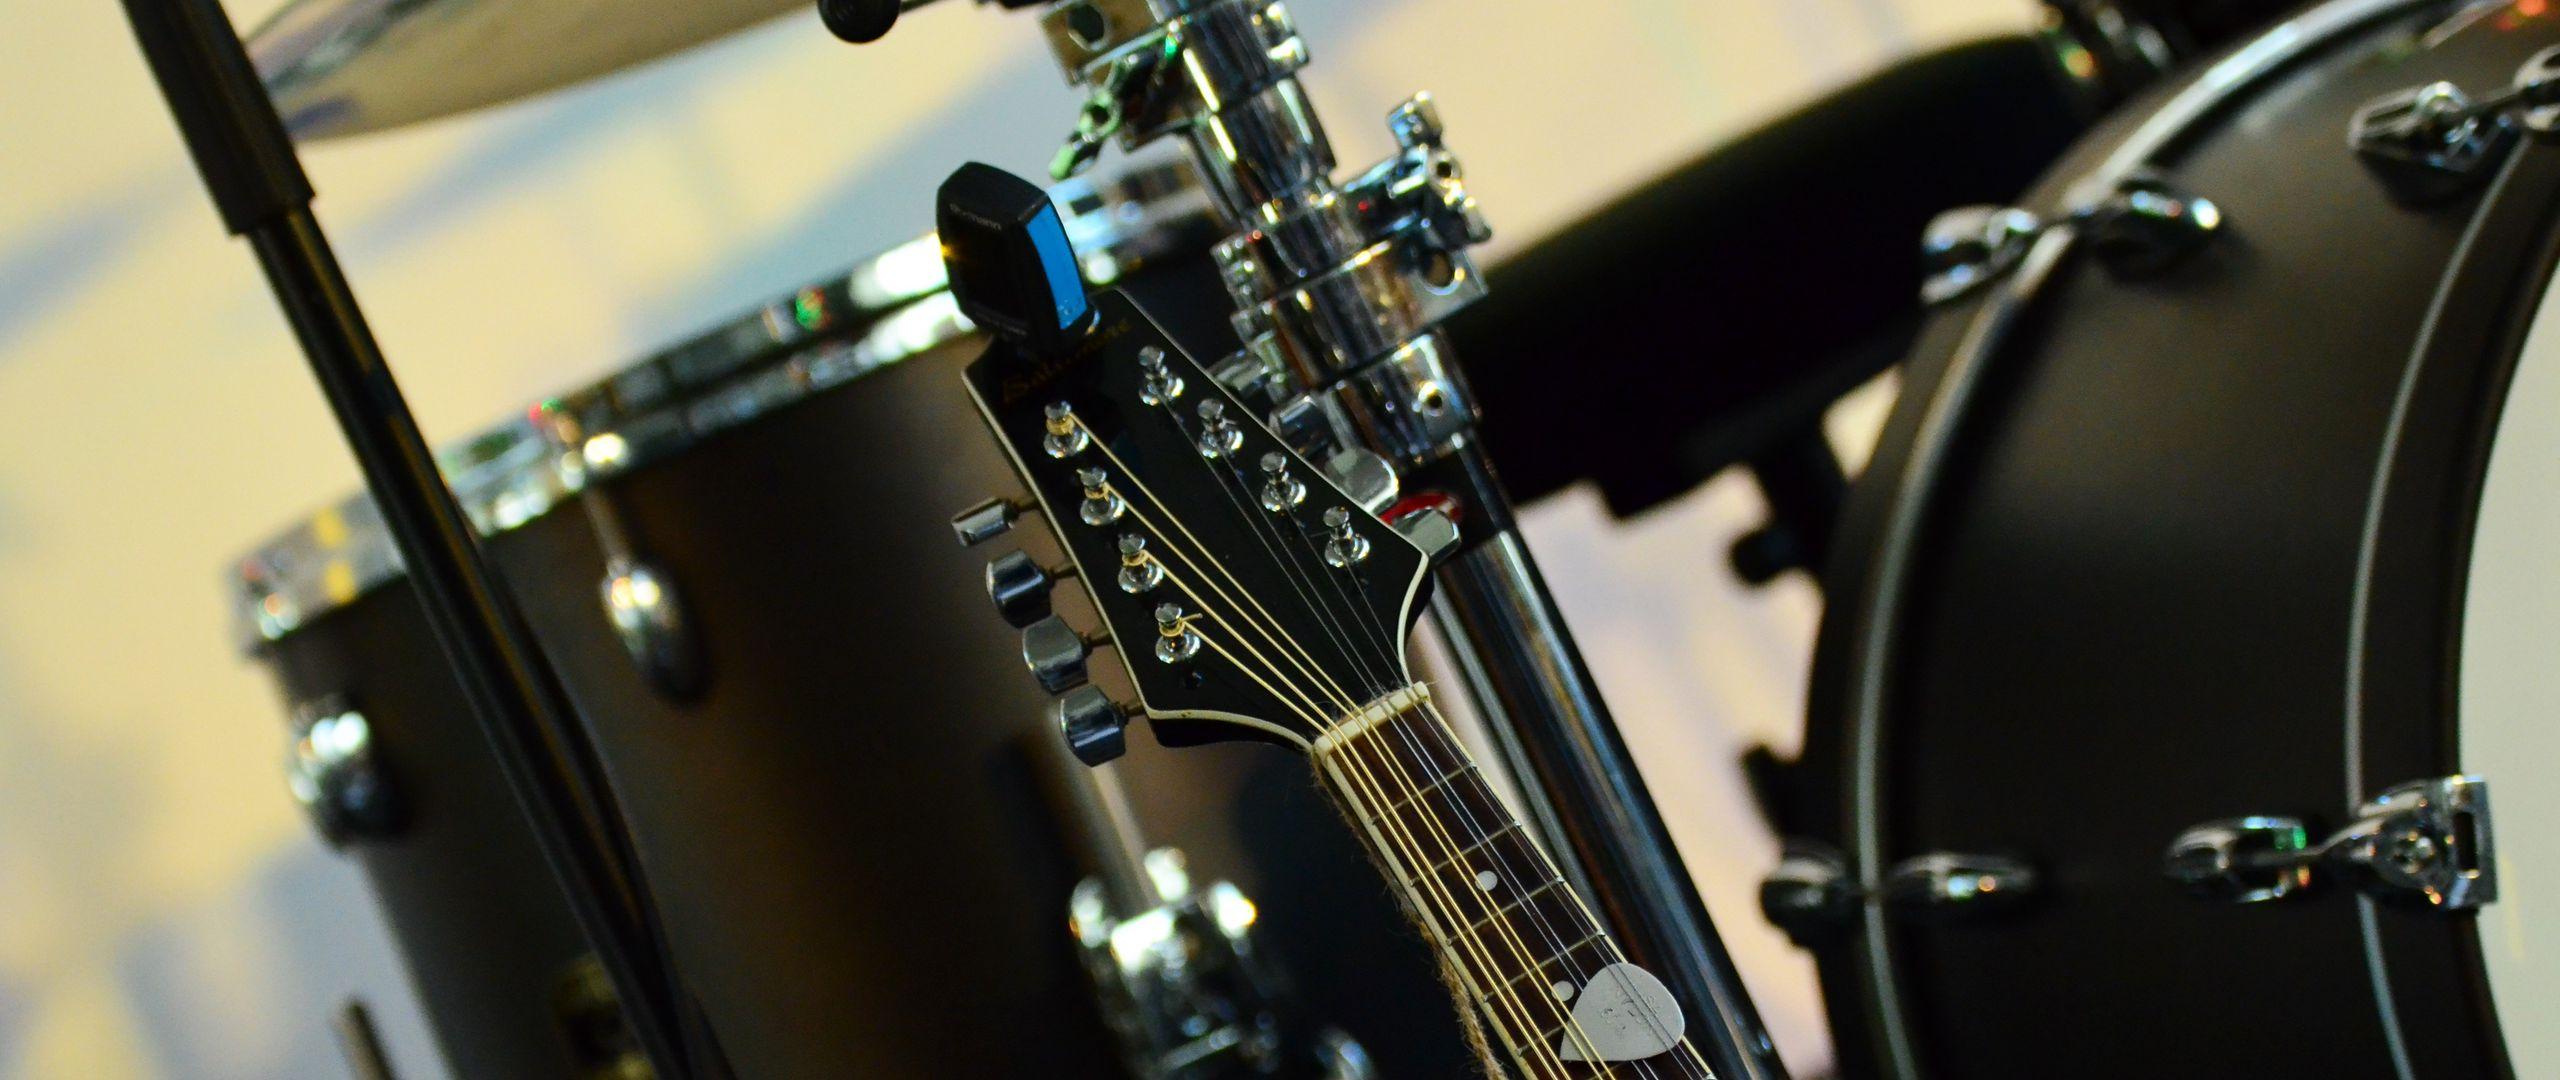 2560x1080 Wallpaper musical instrument, music, percussion, guitar